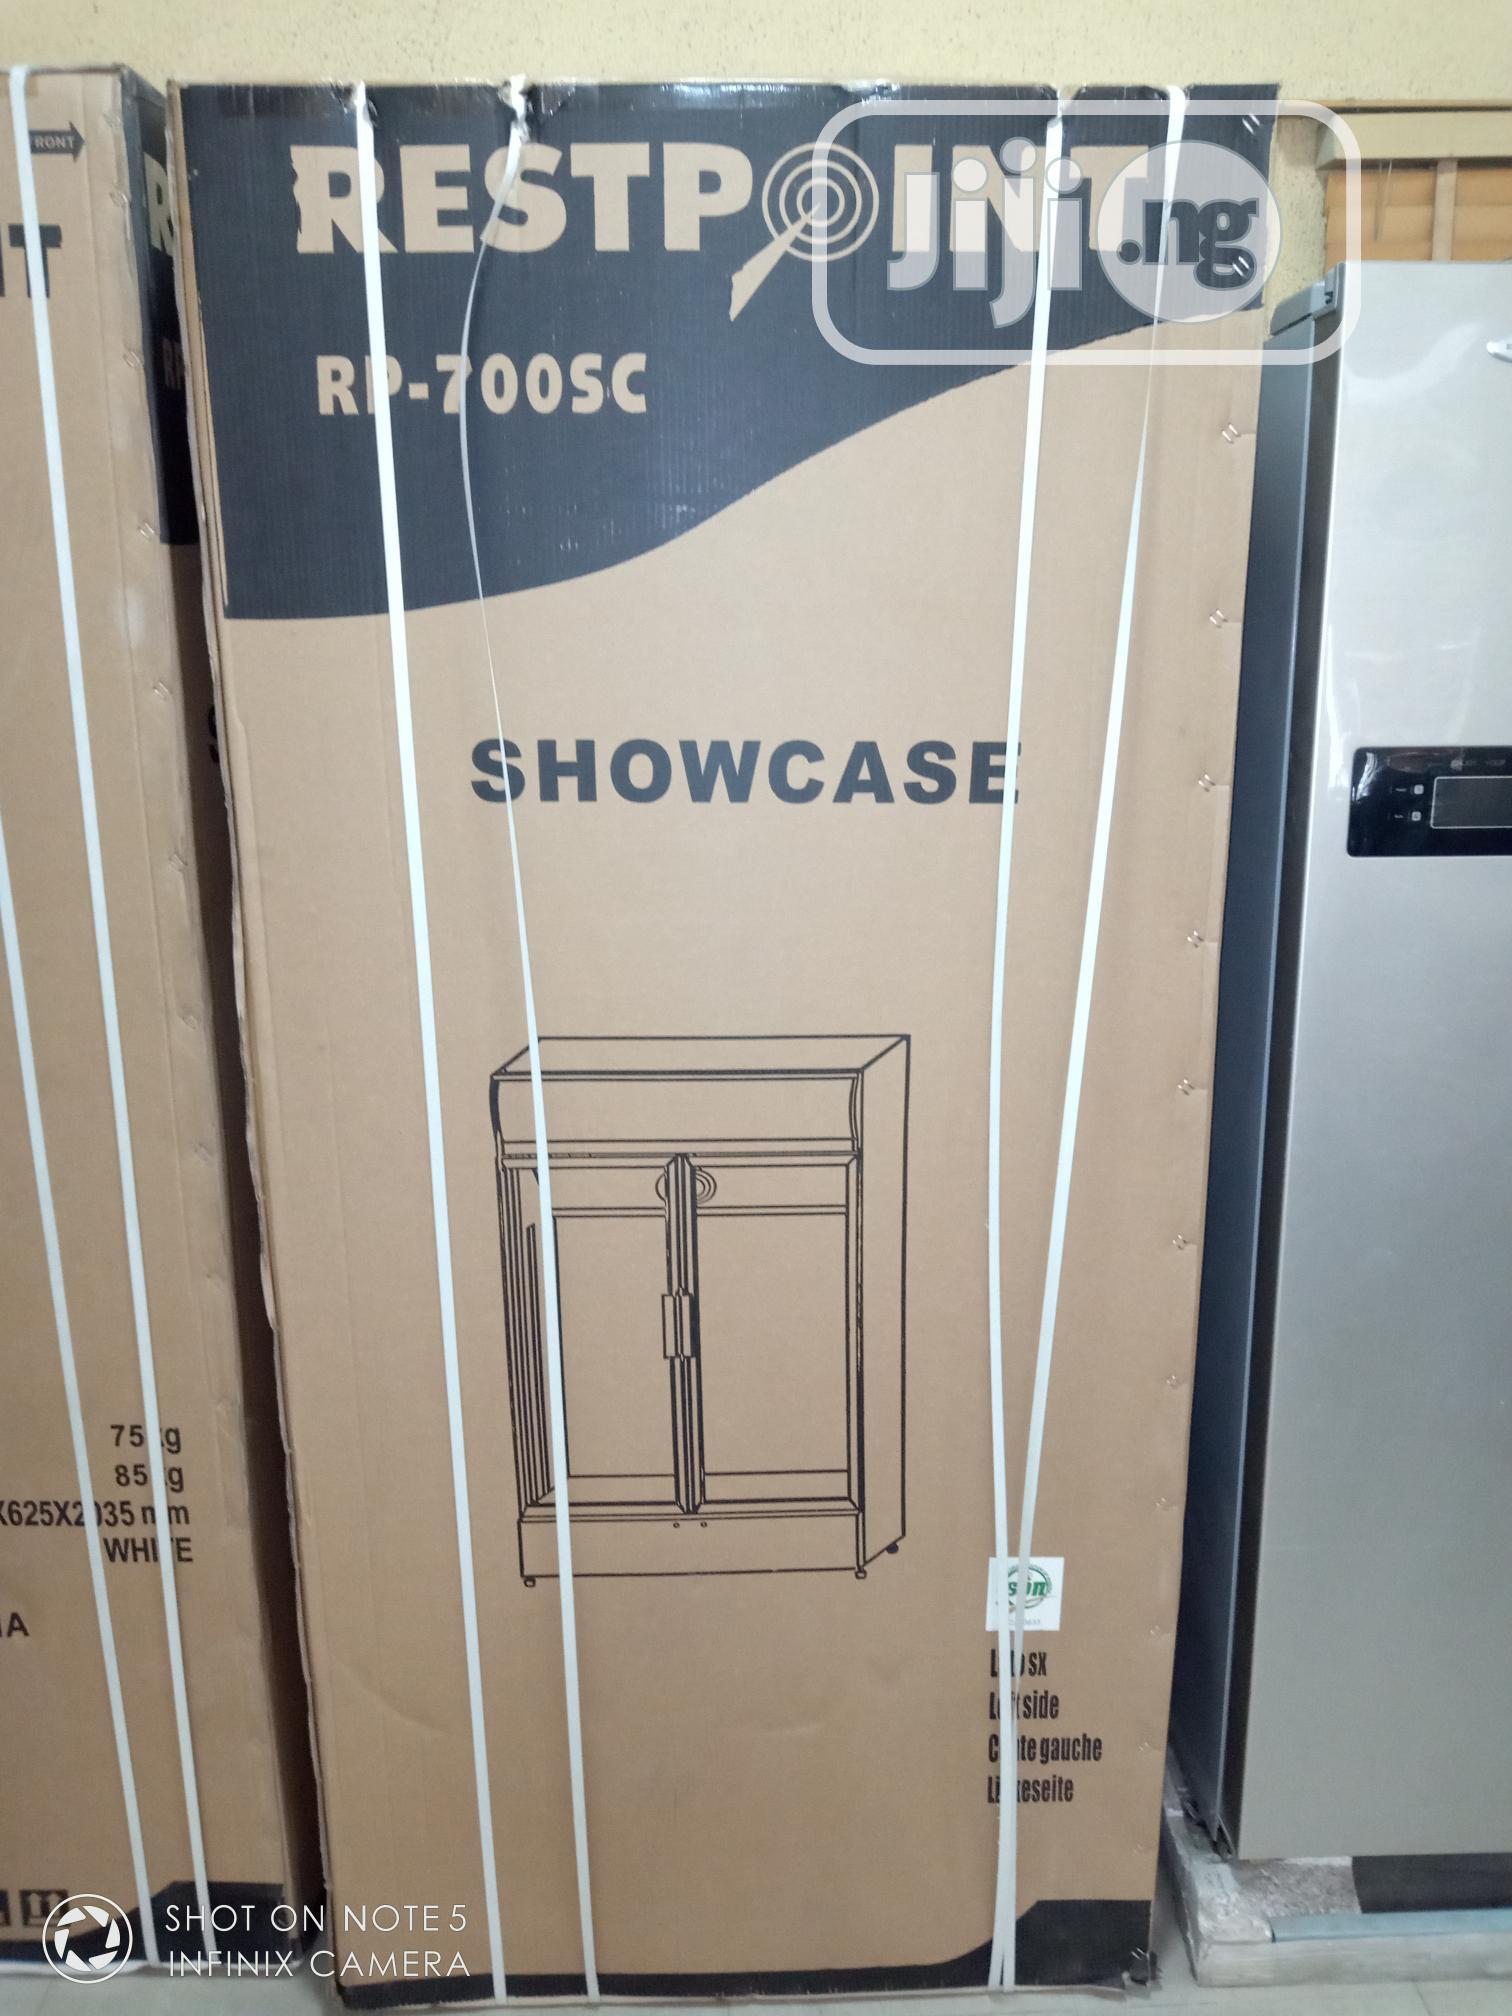 Super Restpoint ( Rp 700 L ) Fridge Display Chiller Showcase+Warranty | Store Equipment for sale in Ojo, Lagos State, Nigeria